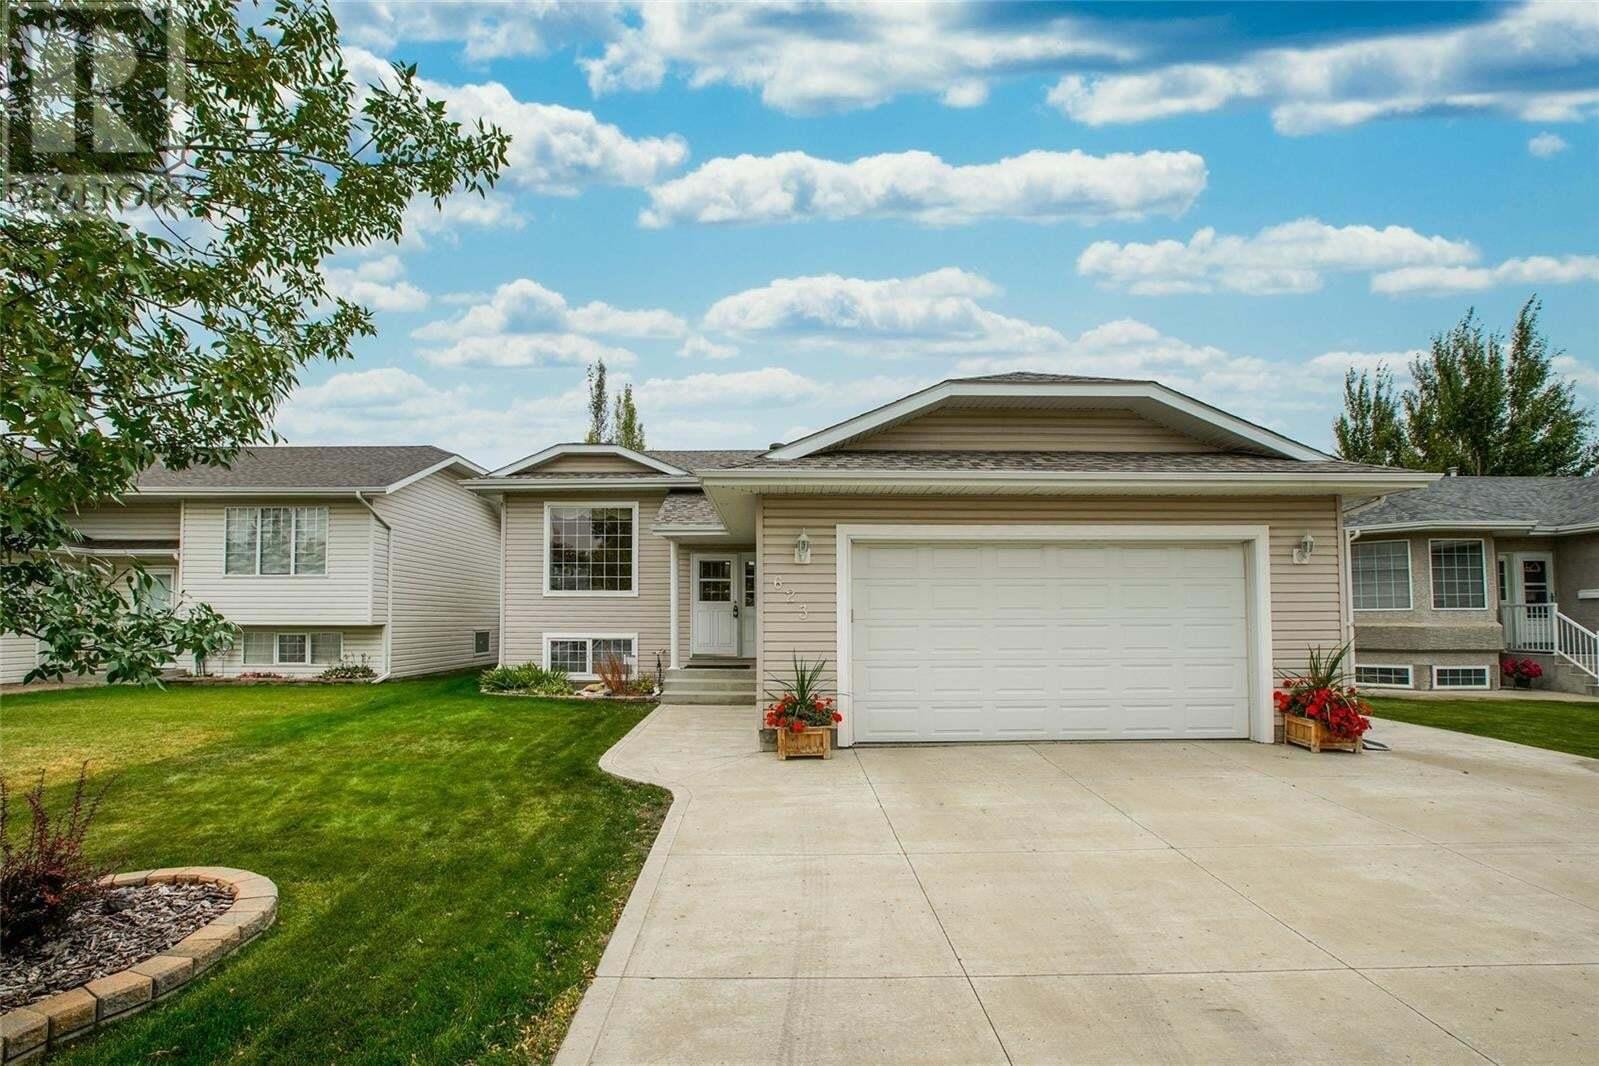 House for sale at 623 Peterson Cres Saskatoon Saskatchewan - MLS: SK827991